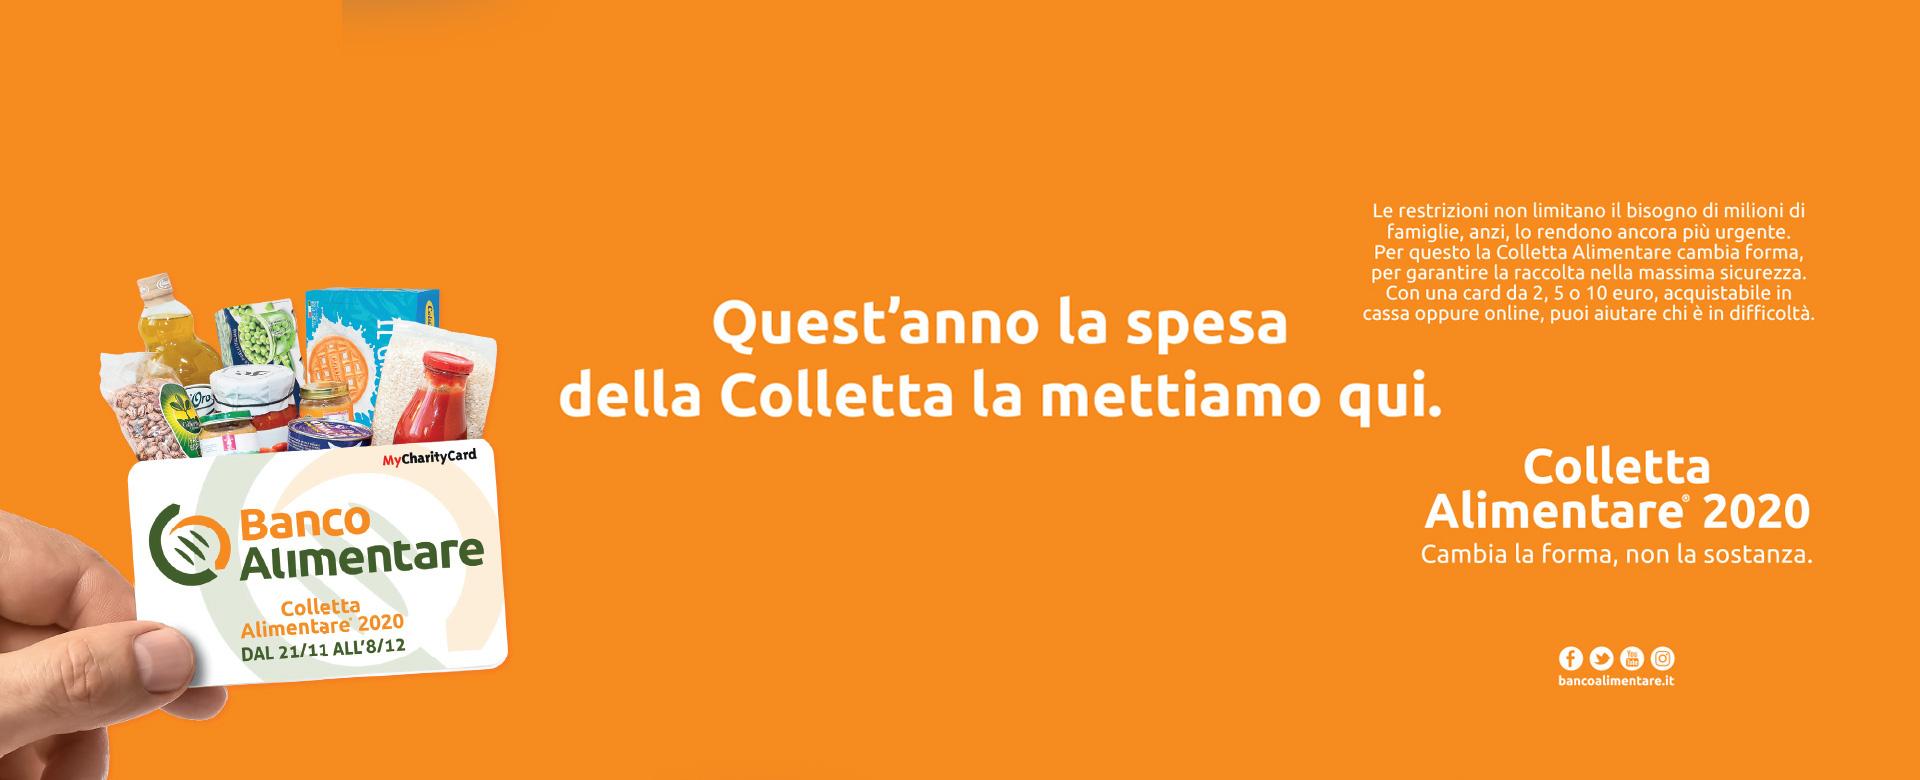 banner_collettaf